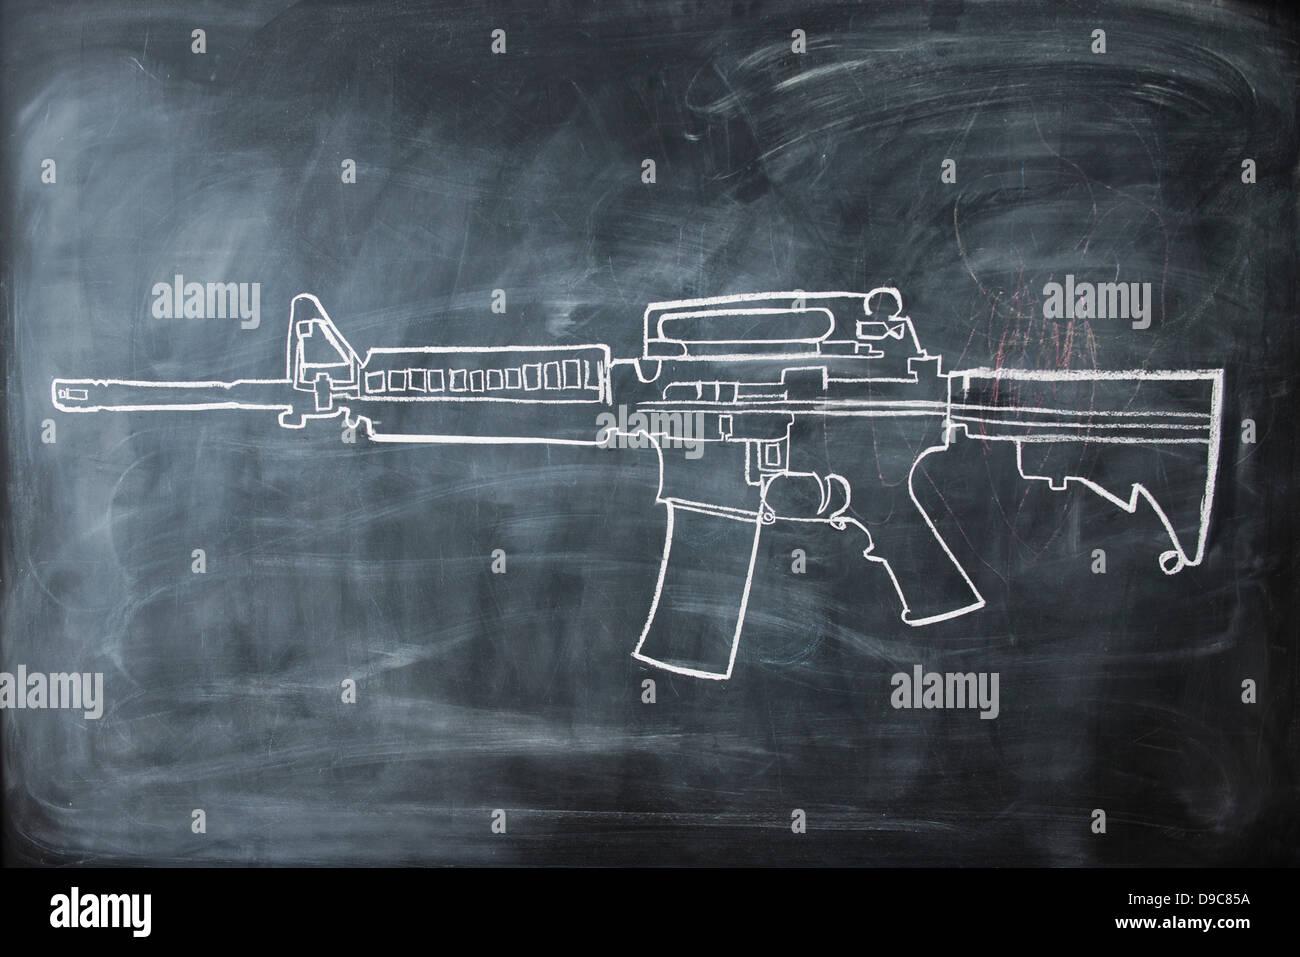 Chalk drawing of gun on blackboard Stock Photo